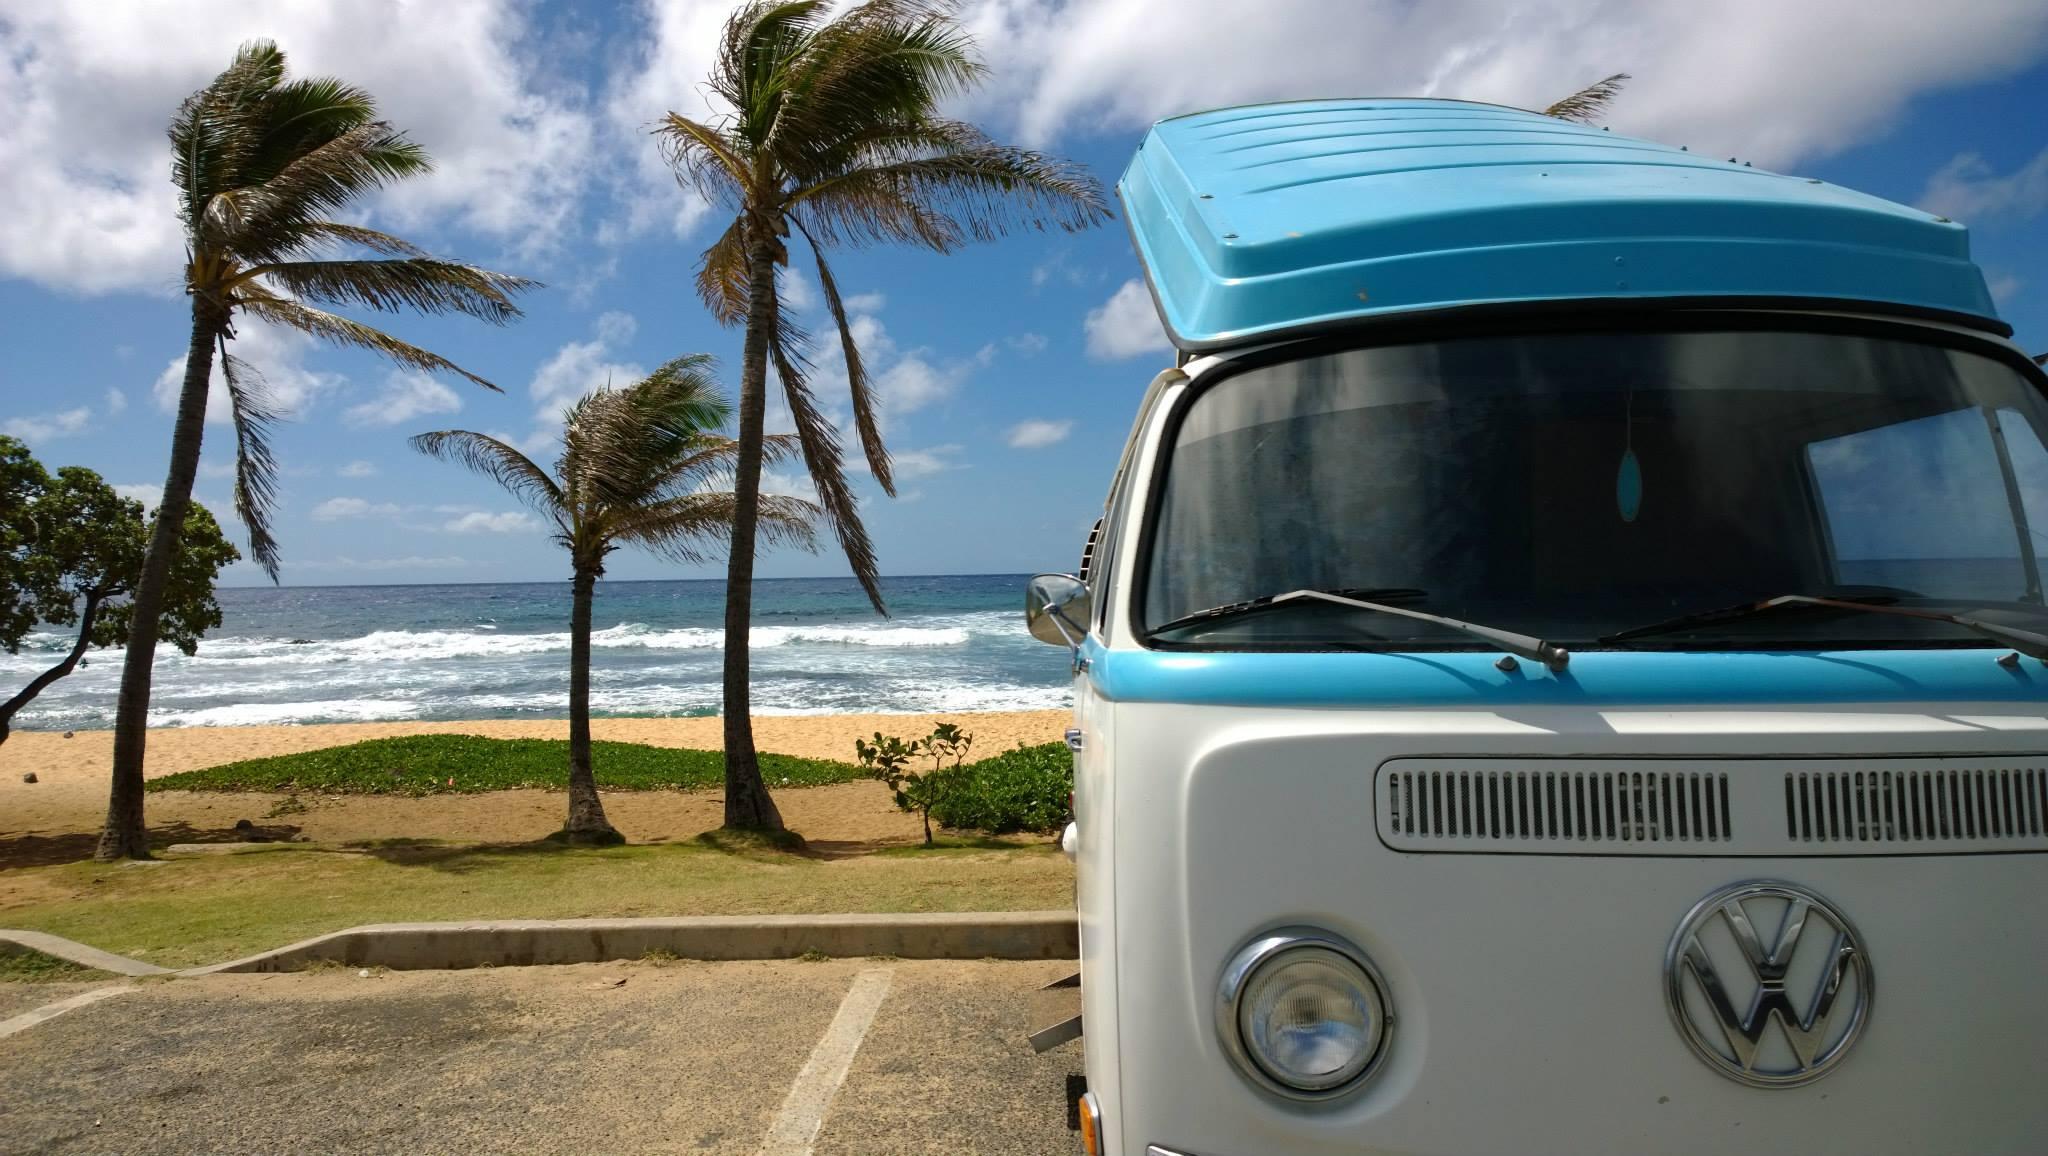 Vintage VW bus parked at Sandy Beach in Oahu